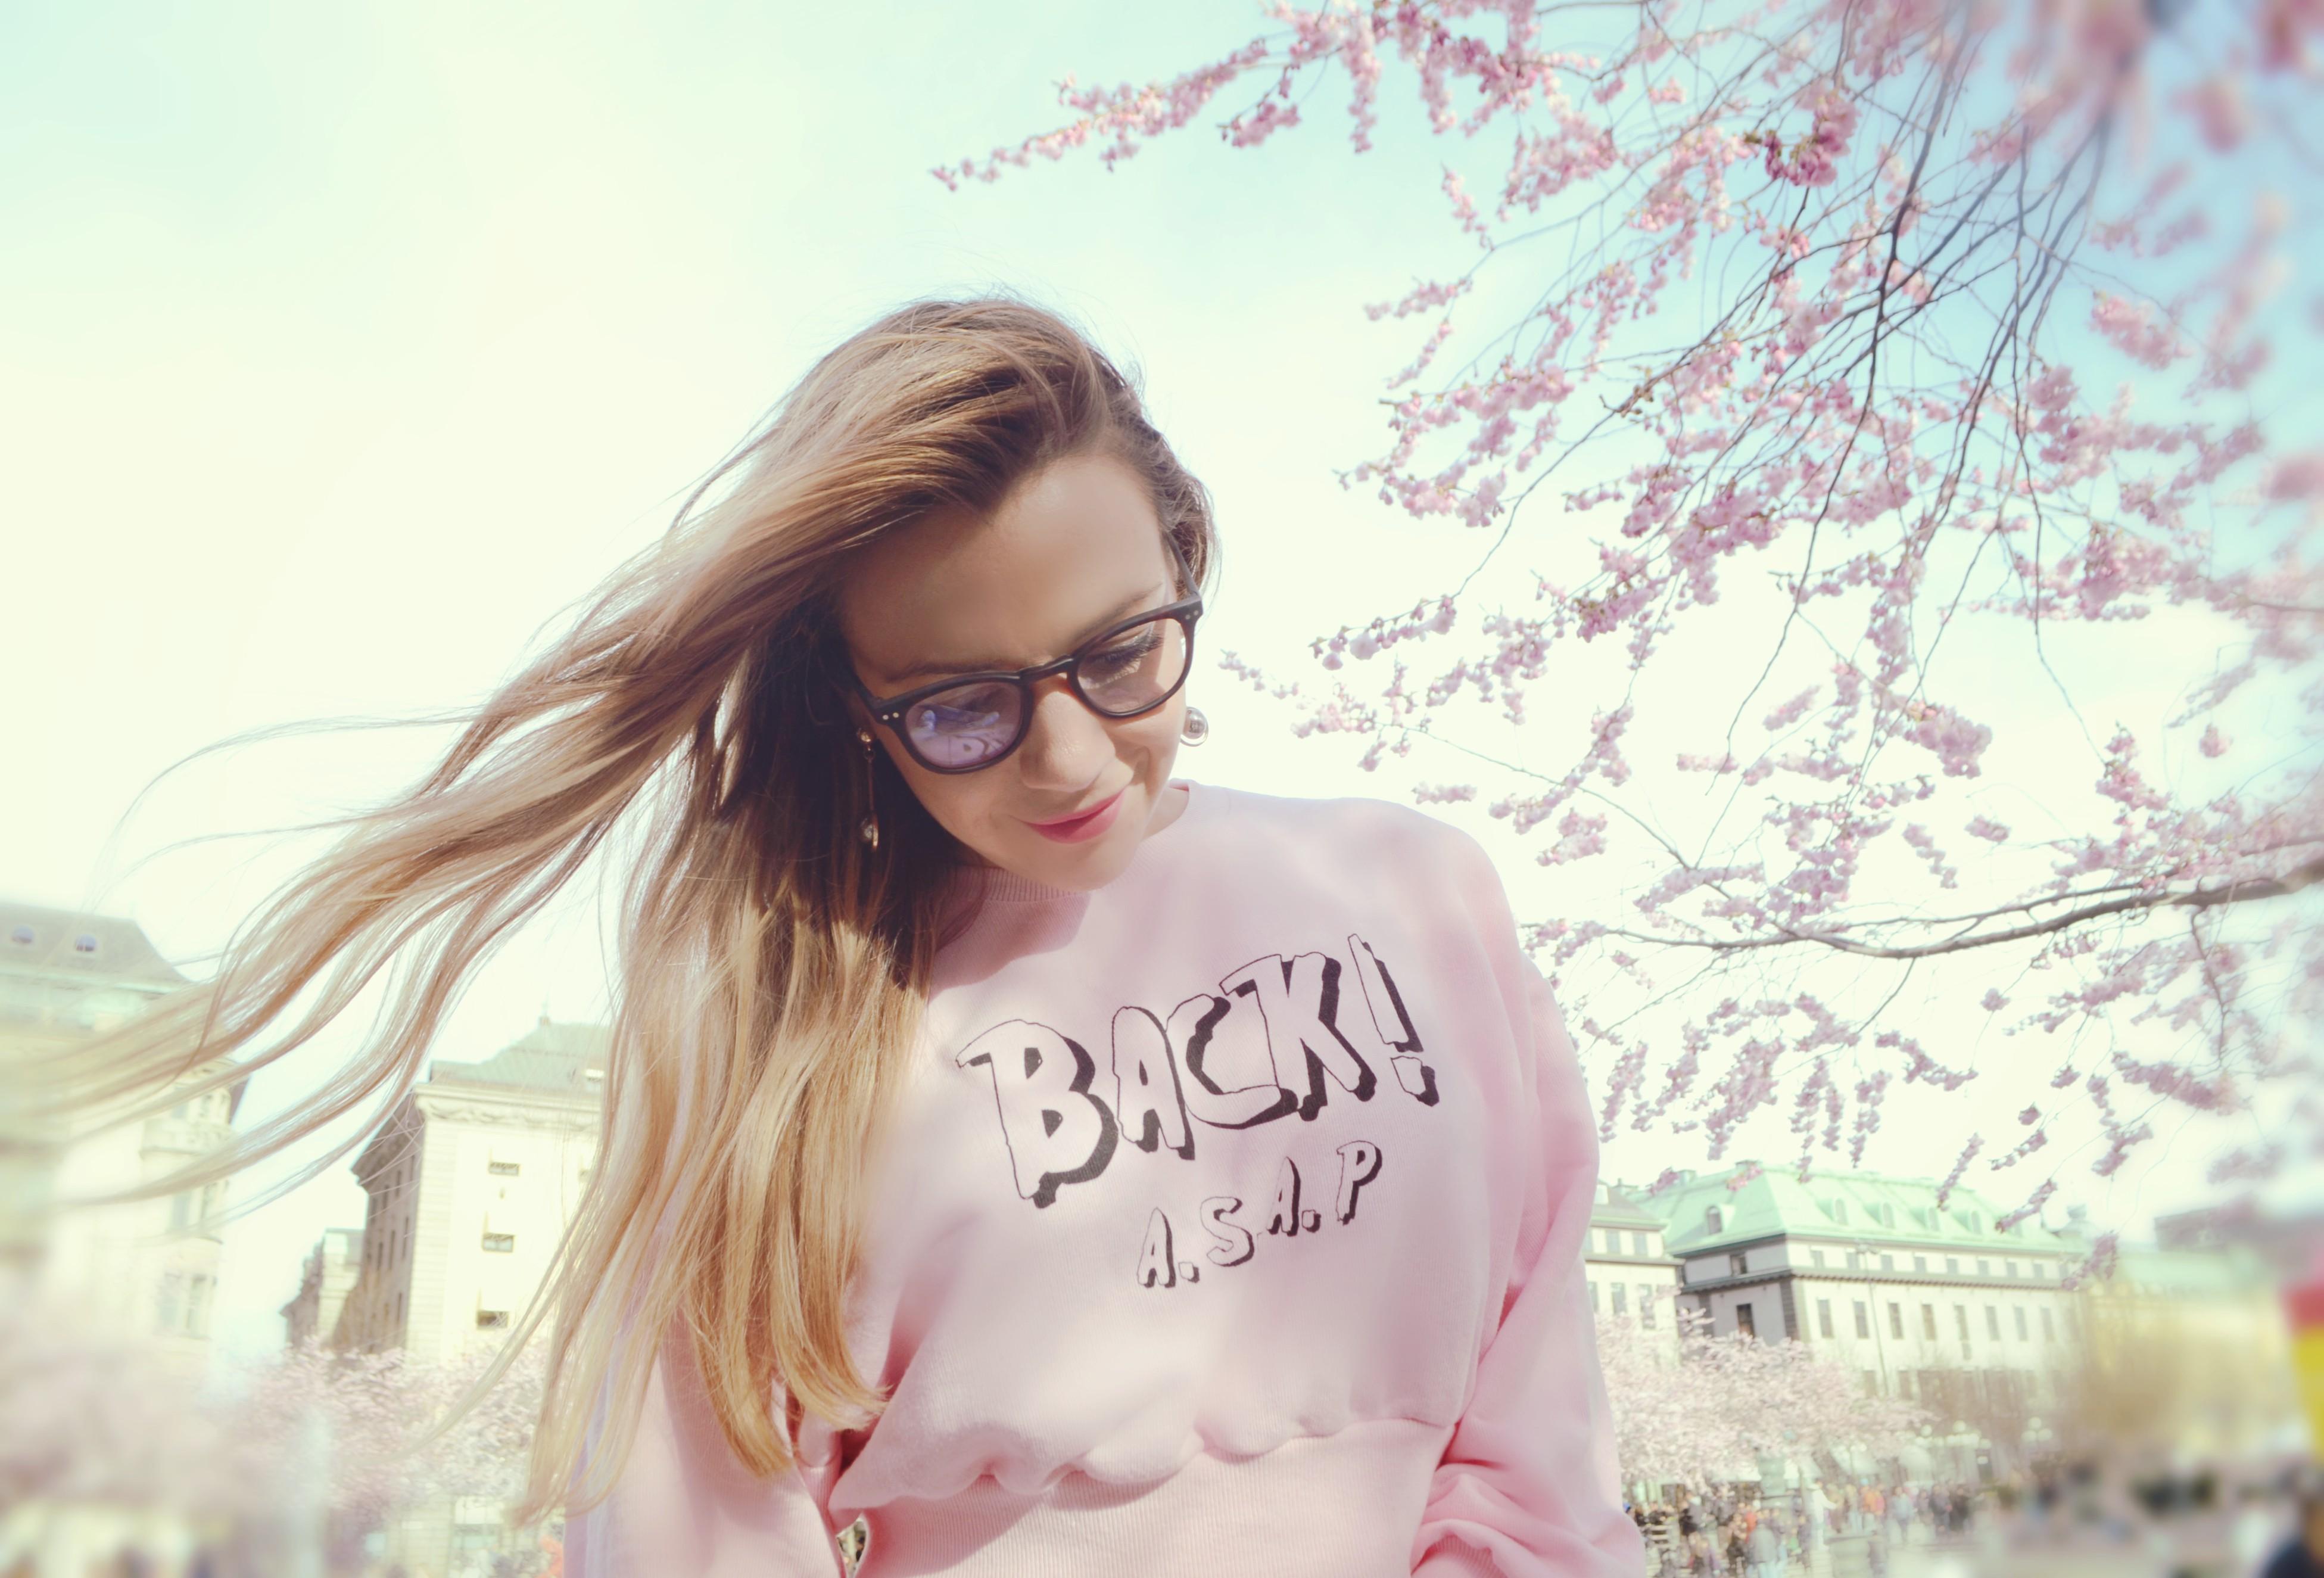 ChicAdicta-fashionista-blog-de-moda-influencer-Chic-Adicta-90s-style-cherry-blossom-estocolmo-PiensaenChic-Piensa-en-Chic